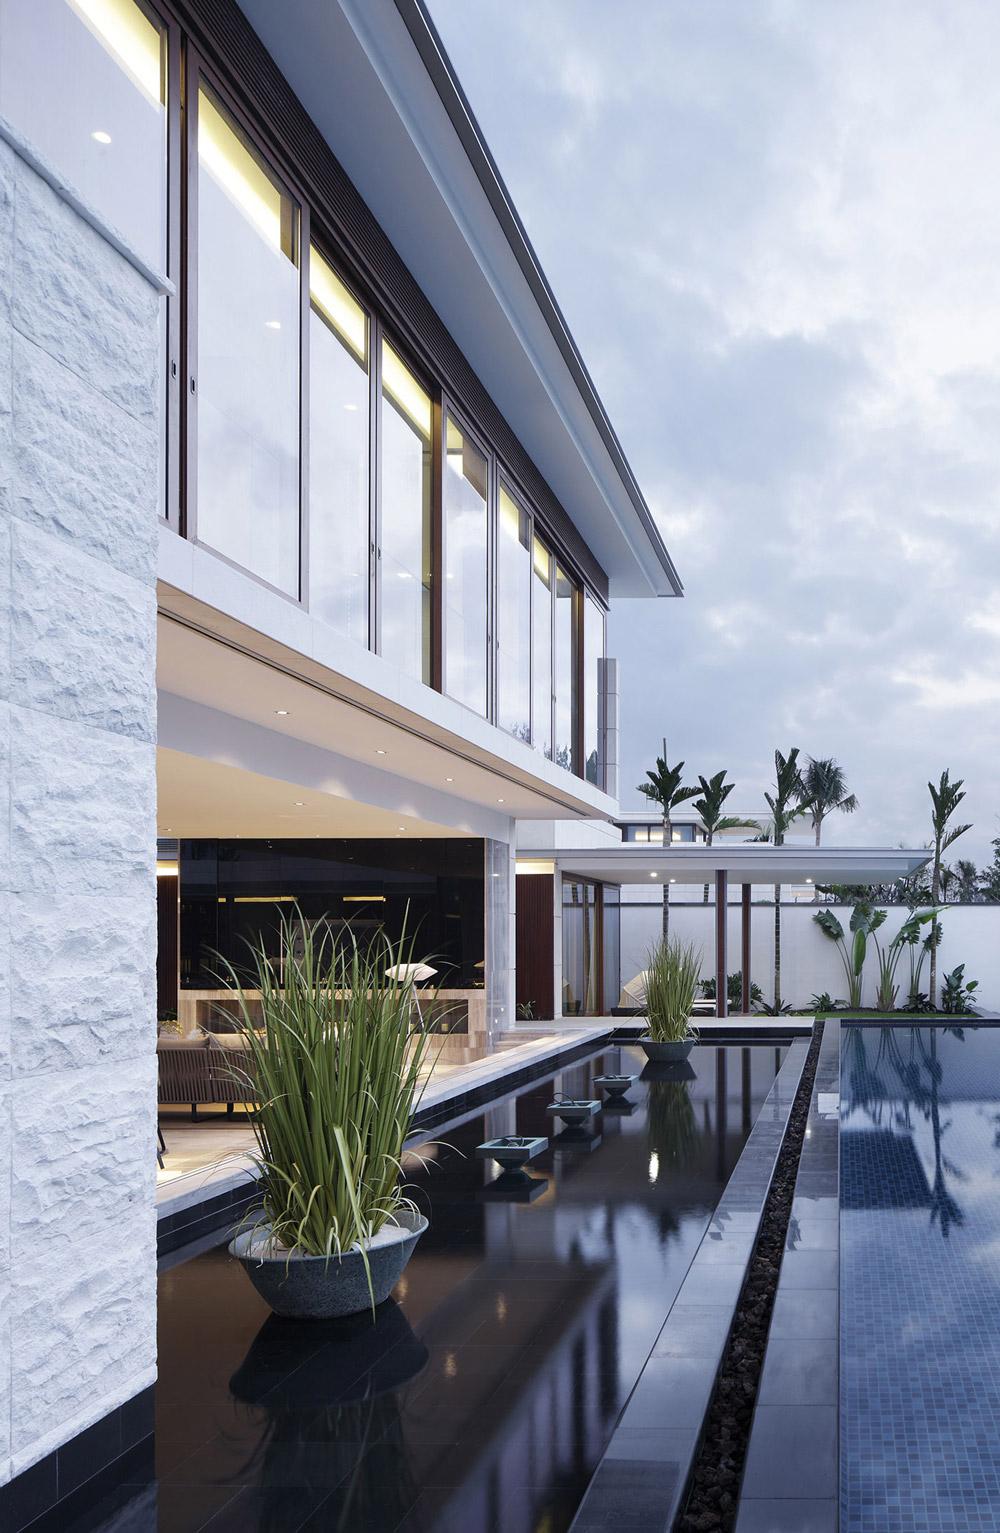 Water Feature, Pool, Beachside Villas in Lingshui, Hainan, China